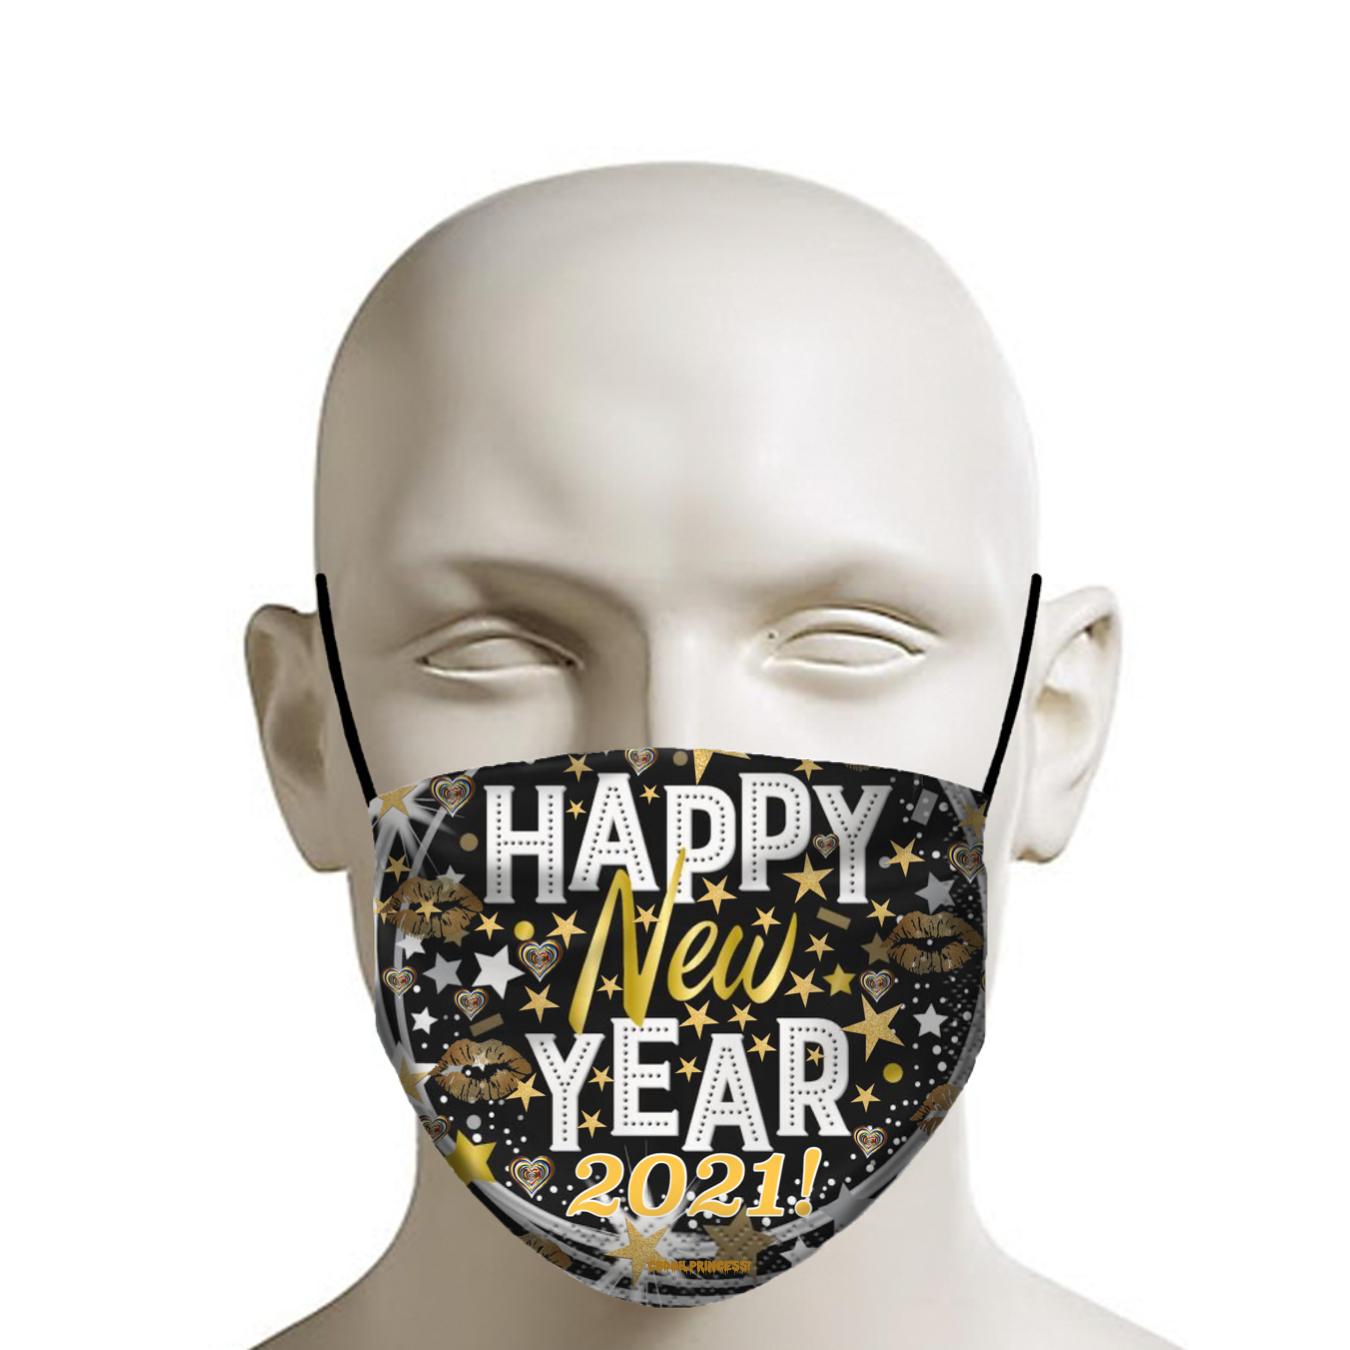 Happy New Year 2021 Face Mask Cbdoilprincess In 2020 Face Mask Happy New Year Happy New